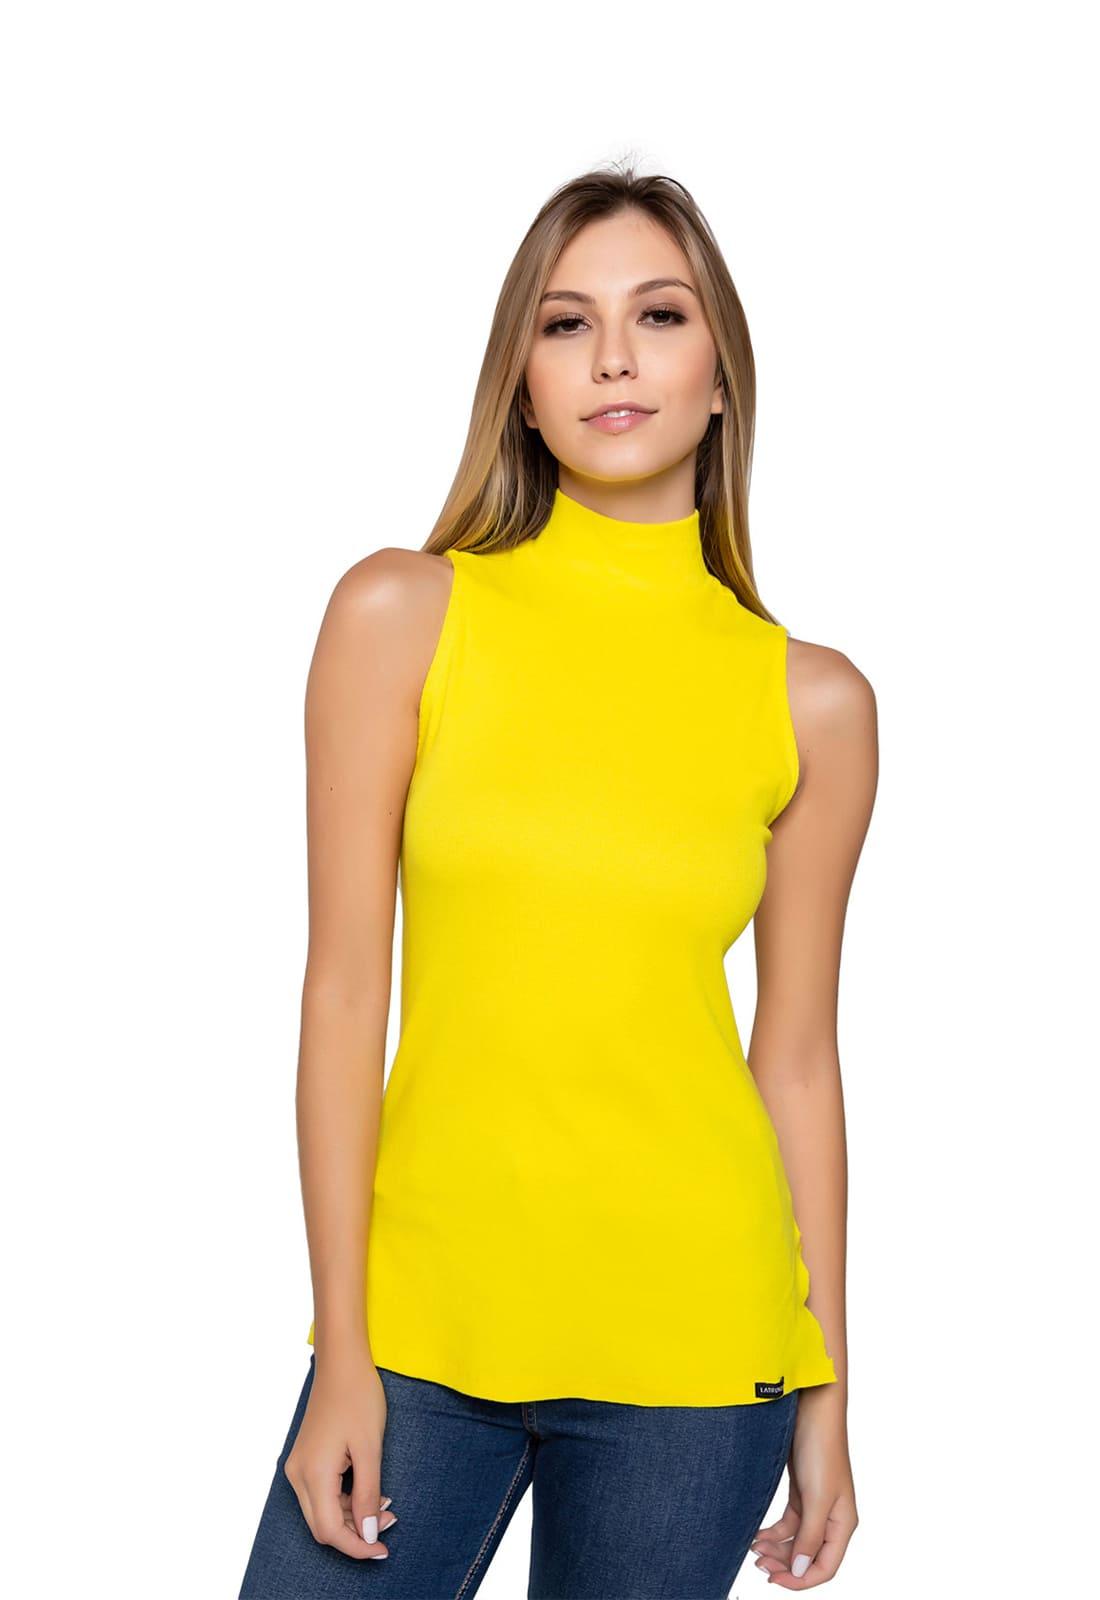 2 Blusas Feminina Latifundio Gola Alta - Cores Amarelo e Rosa